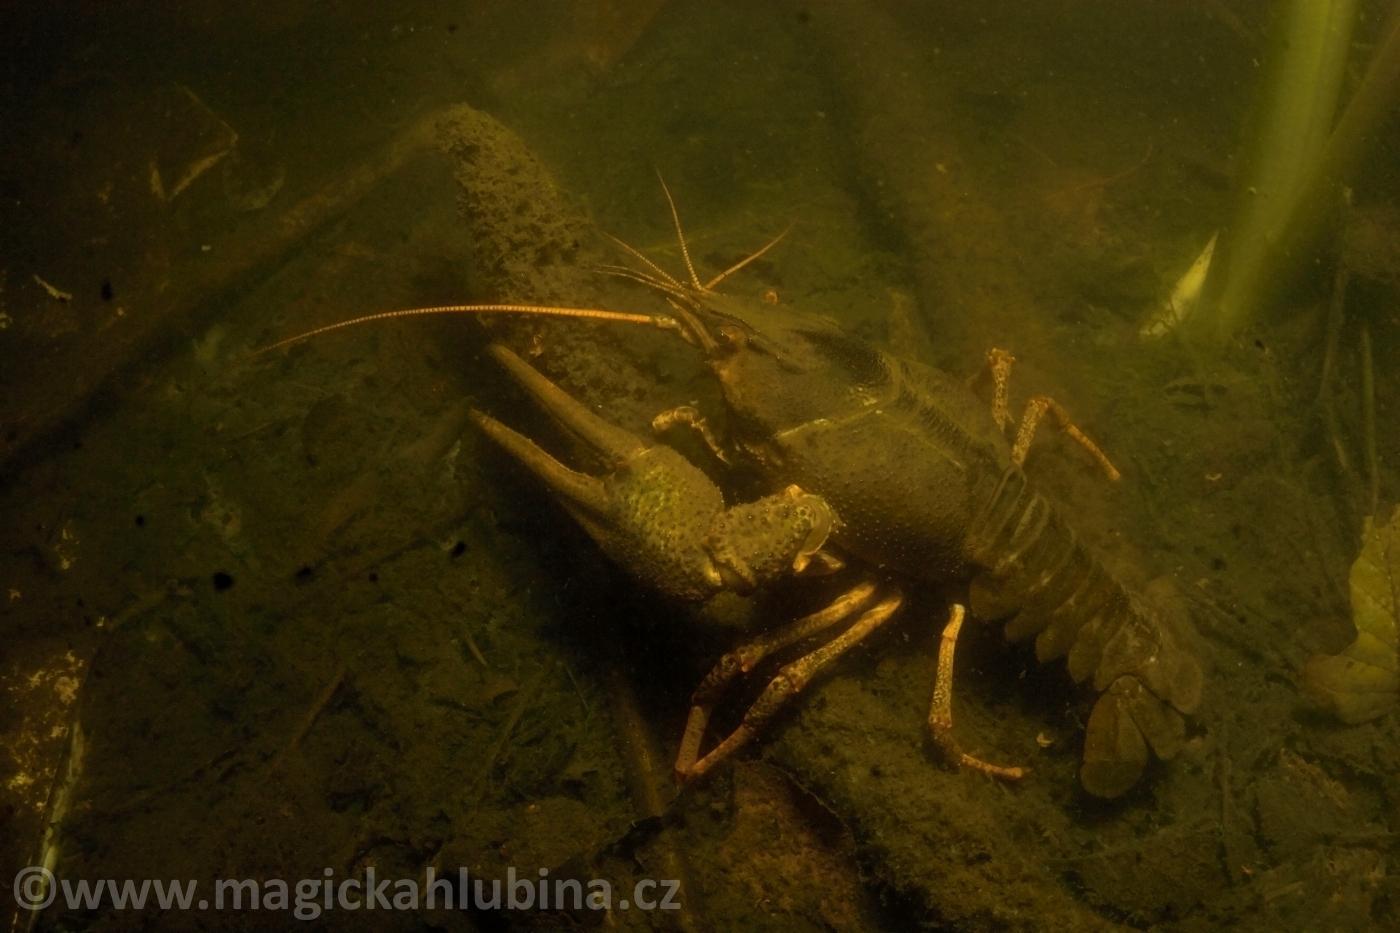 Astacus_leptodactylus_-_Danube_Crayfish